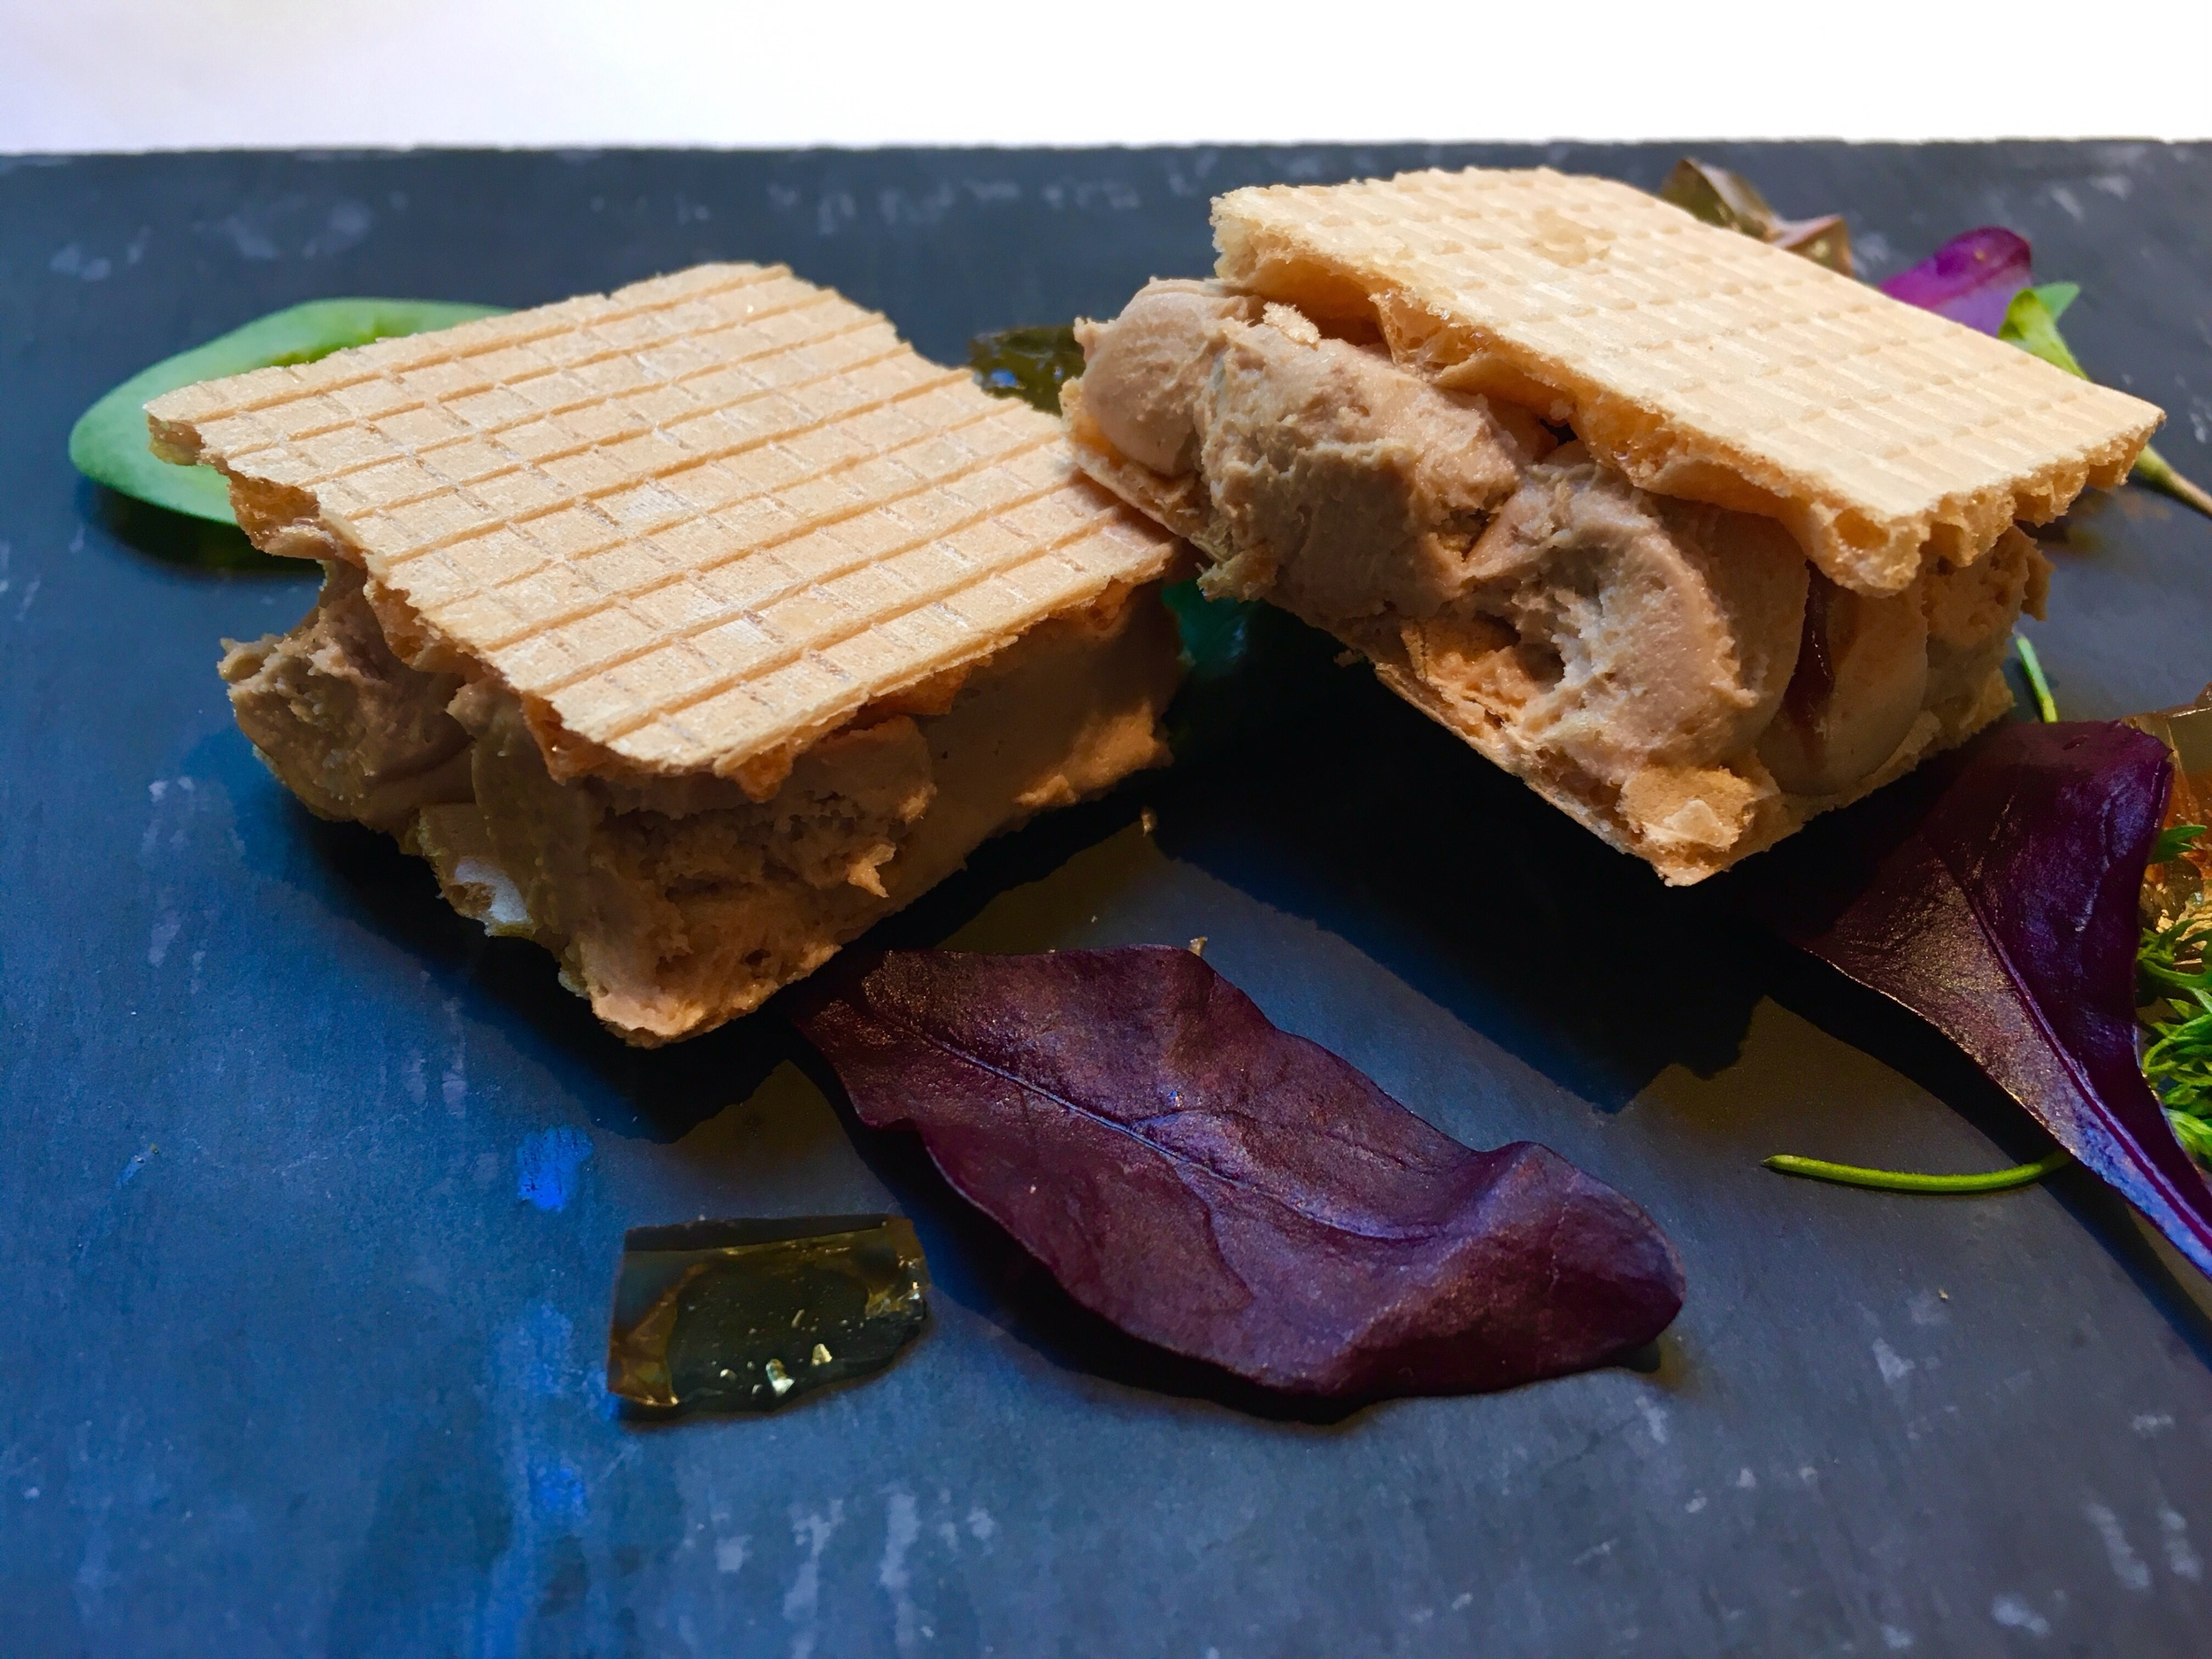 Pheasant pate cracker sandwich